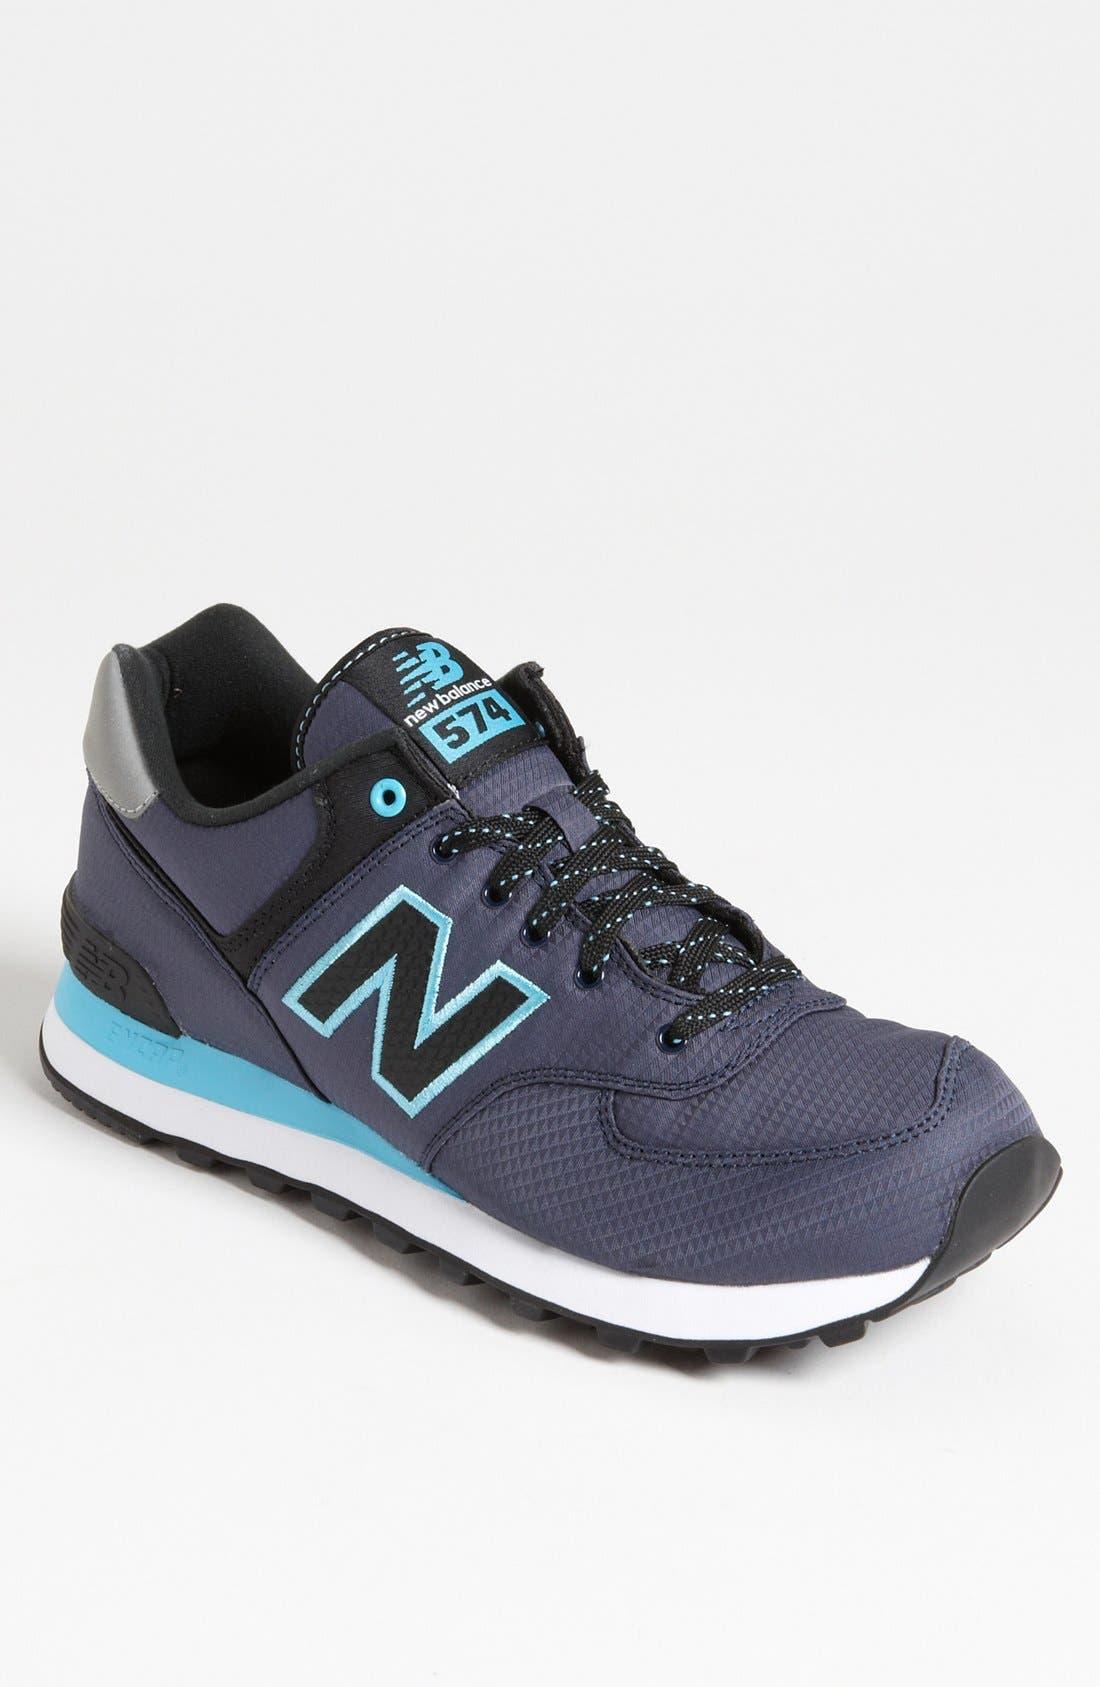 Main Image - New Balance '574 - Windbreaker' Sneaker (Men)